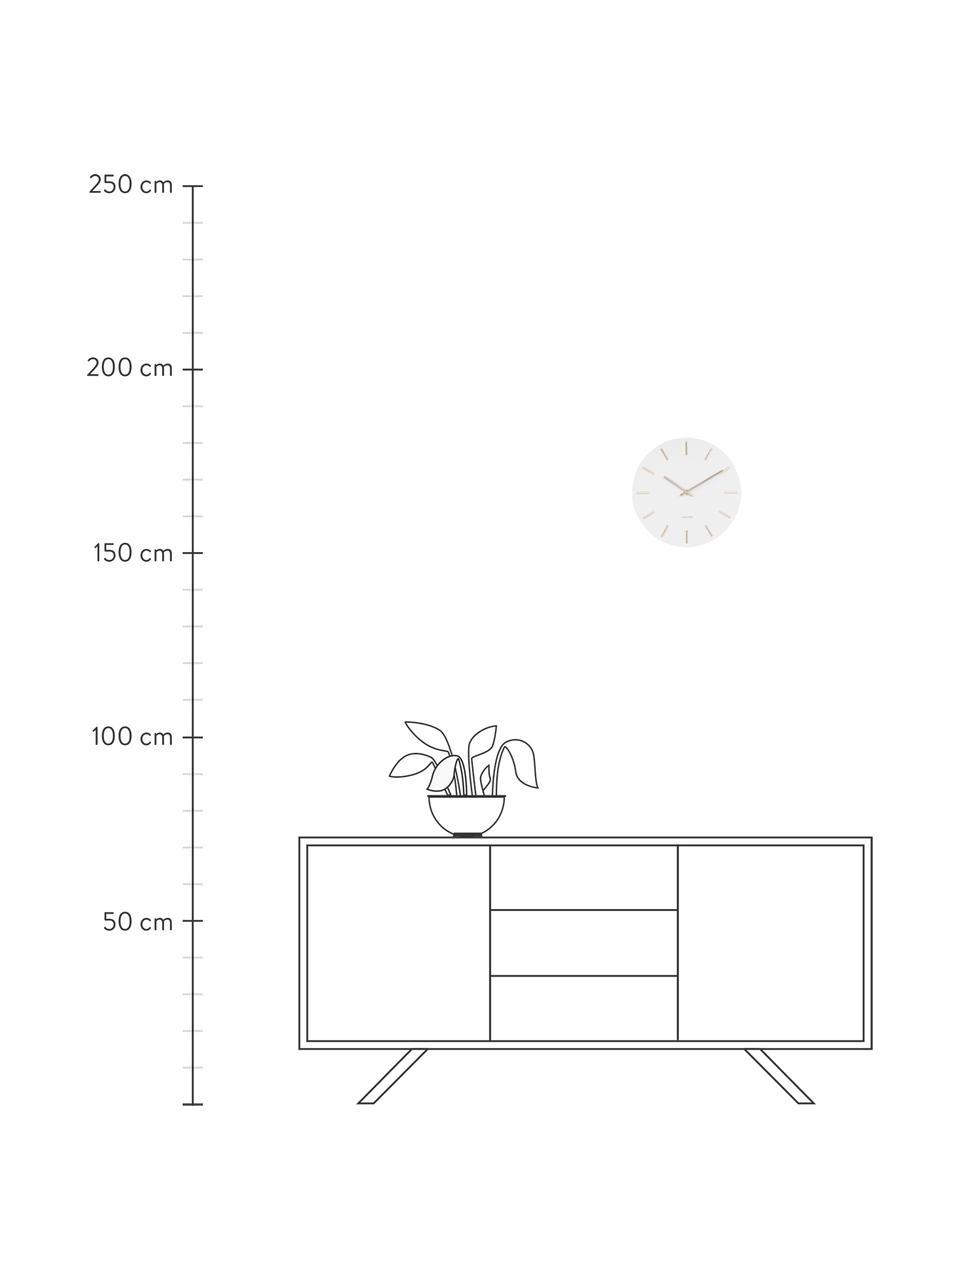 Wandklok Charm, Gelakt staal, Wit, Ø 30 x D 4 cm